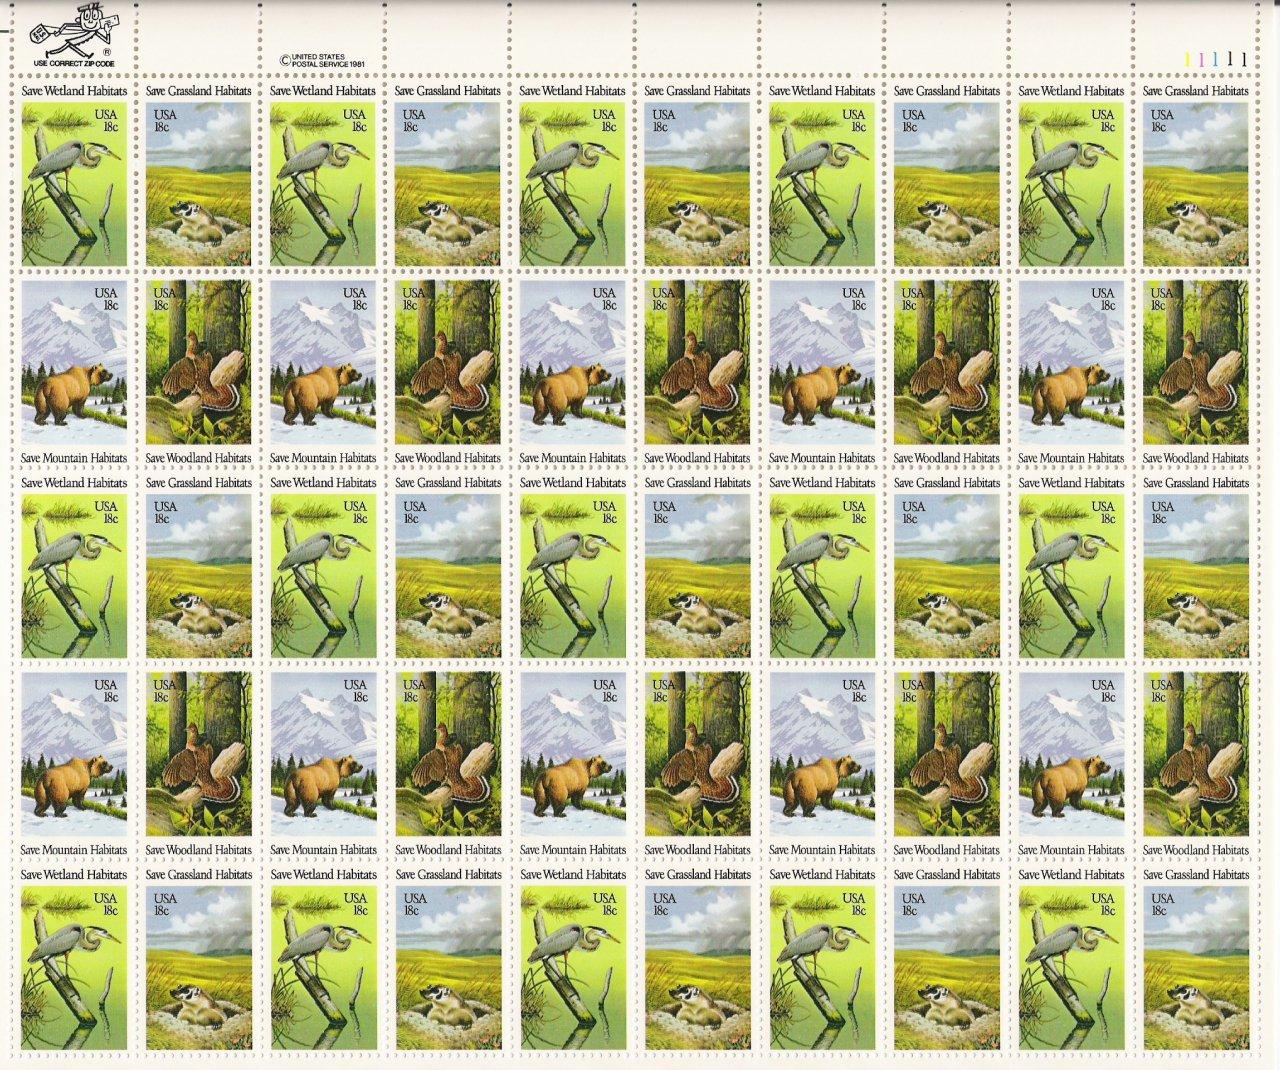 US Scott 1921-1924 - Sheet of 50 - Save Wildlife Habitats - Mint Never Hinged